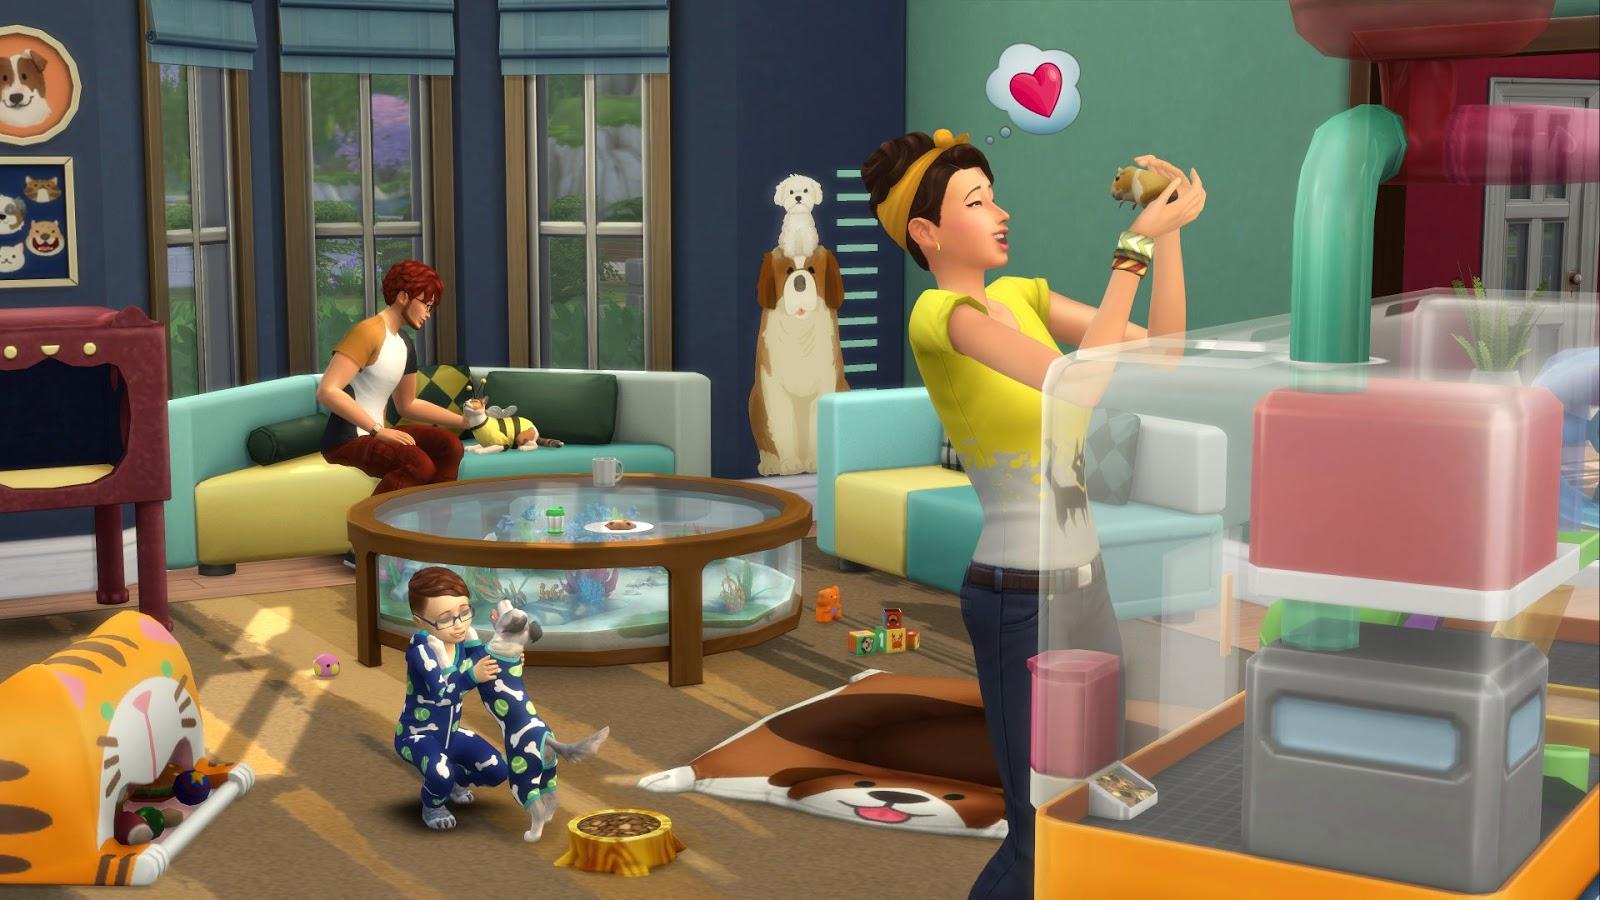 Los Sims 4 Mi Primera Mascota (CODEX) + REPACK PROPER 5 DVD5 + 1 ISO (JPW) 1